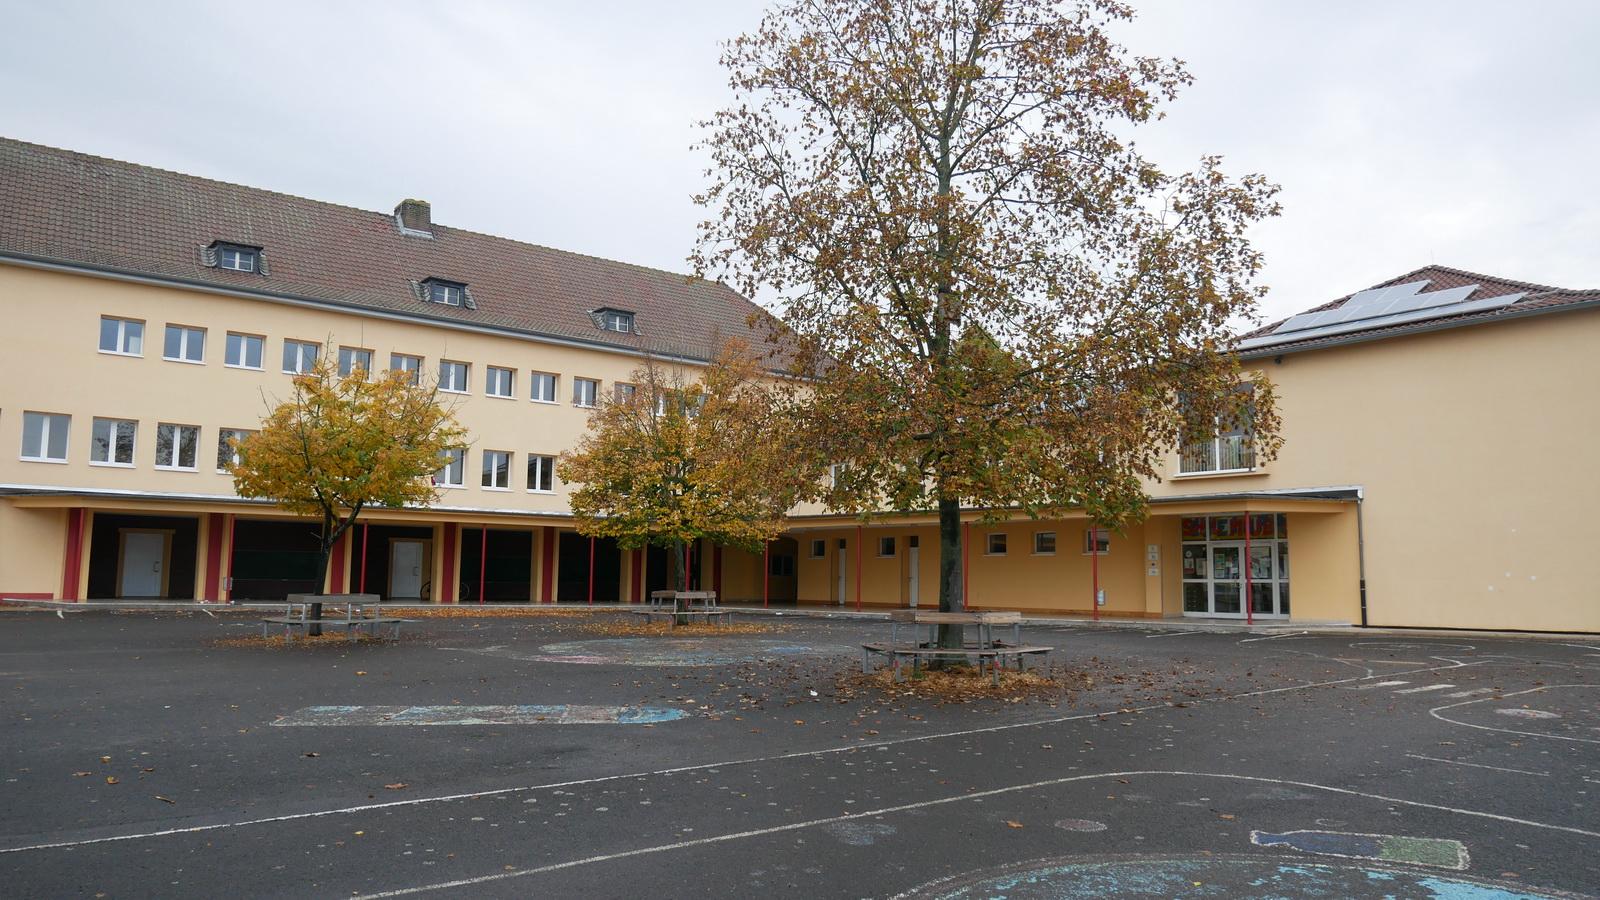 Grundschule, Pausenhof